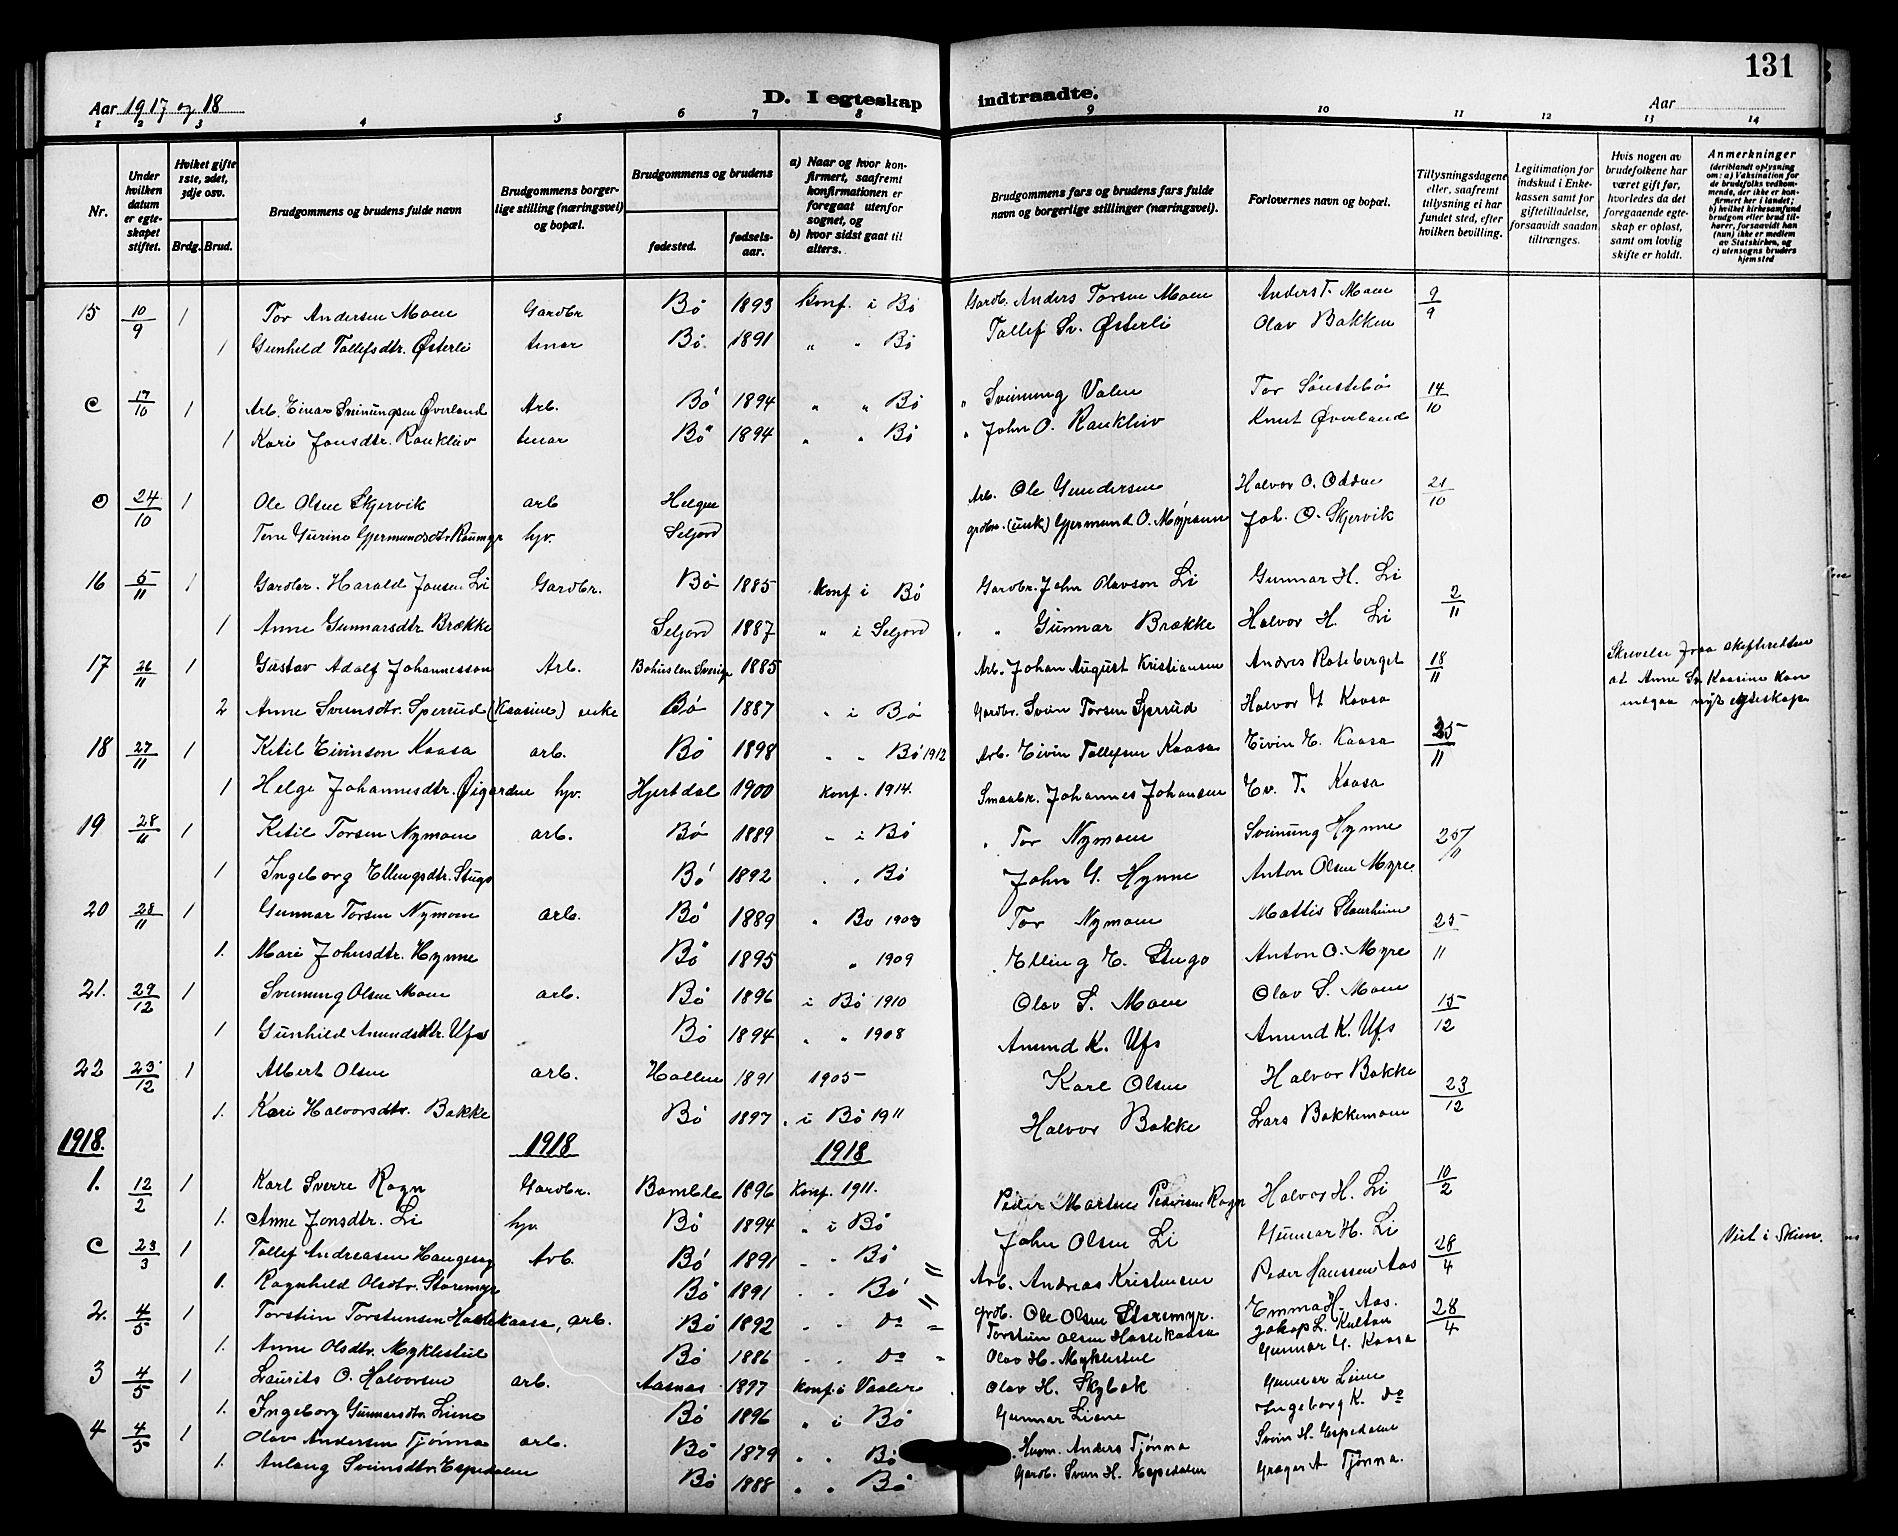 SAKO, Bø kirkebøker, G/Ga/L0007: Klokkerbok nr. 7, 1909-1924, s. 131